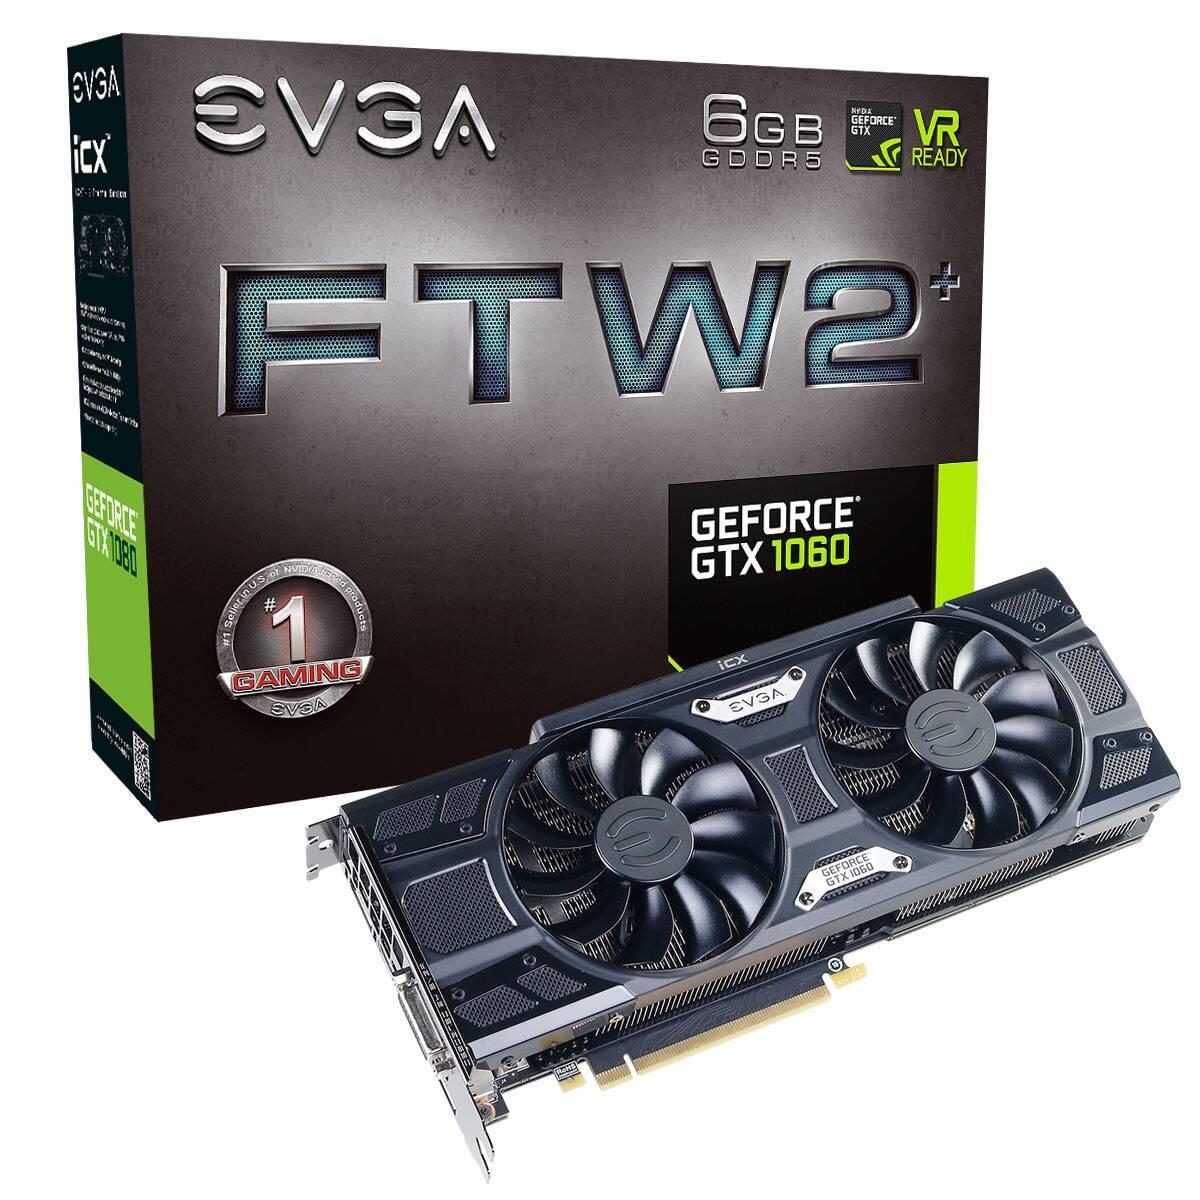 EVGA GeForce GTX1060 6GB GDDR5 FTW2 Version, 9GHz, ICX Cooling, DVI+HDMI+ 3  x Display Port